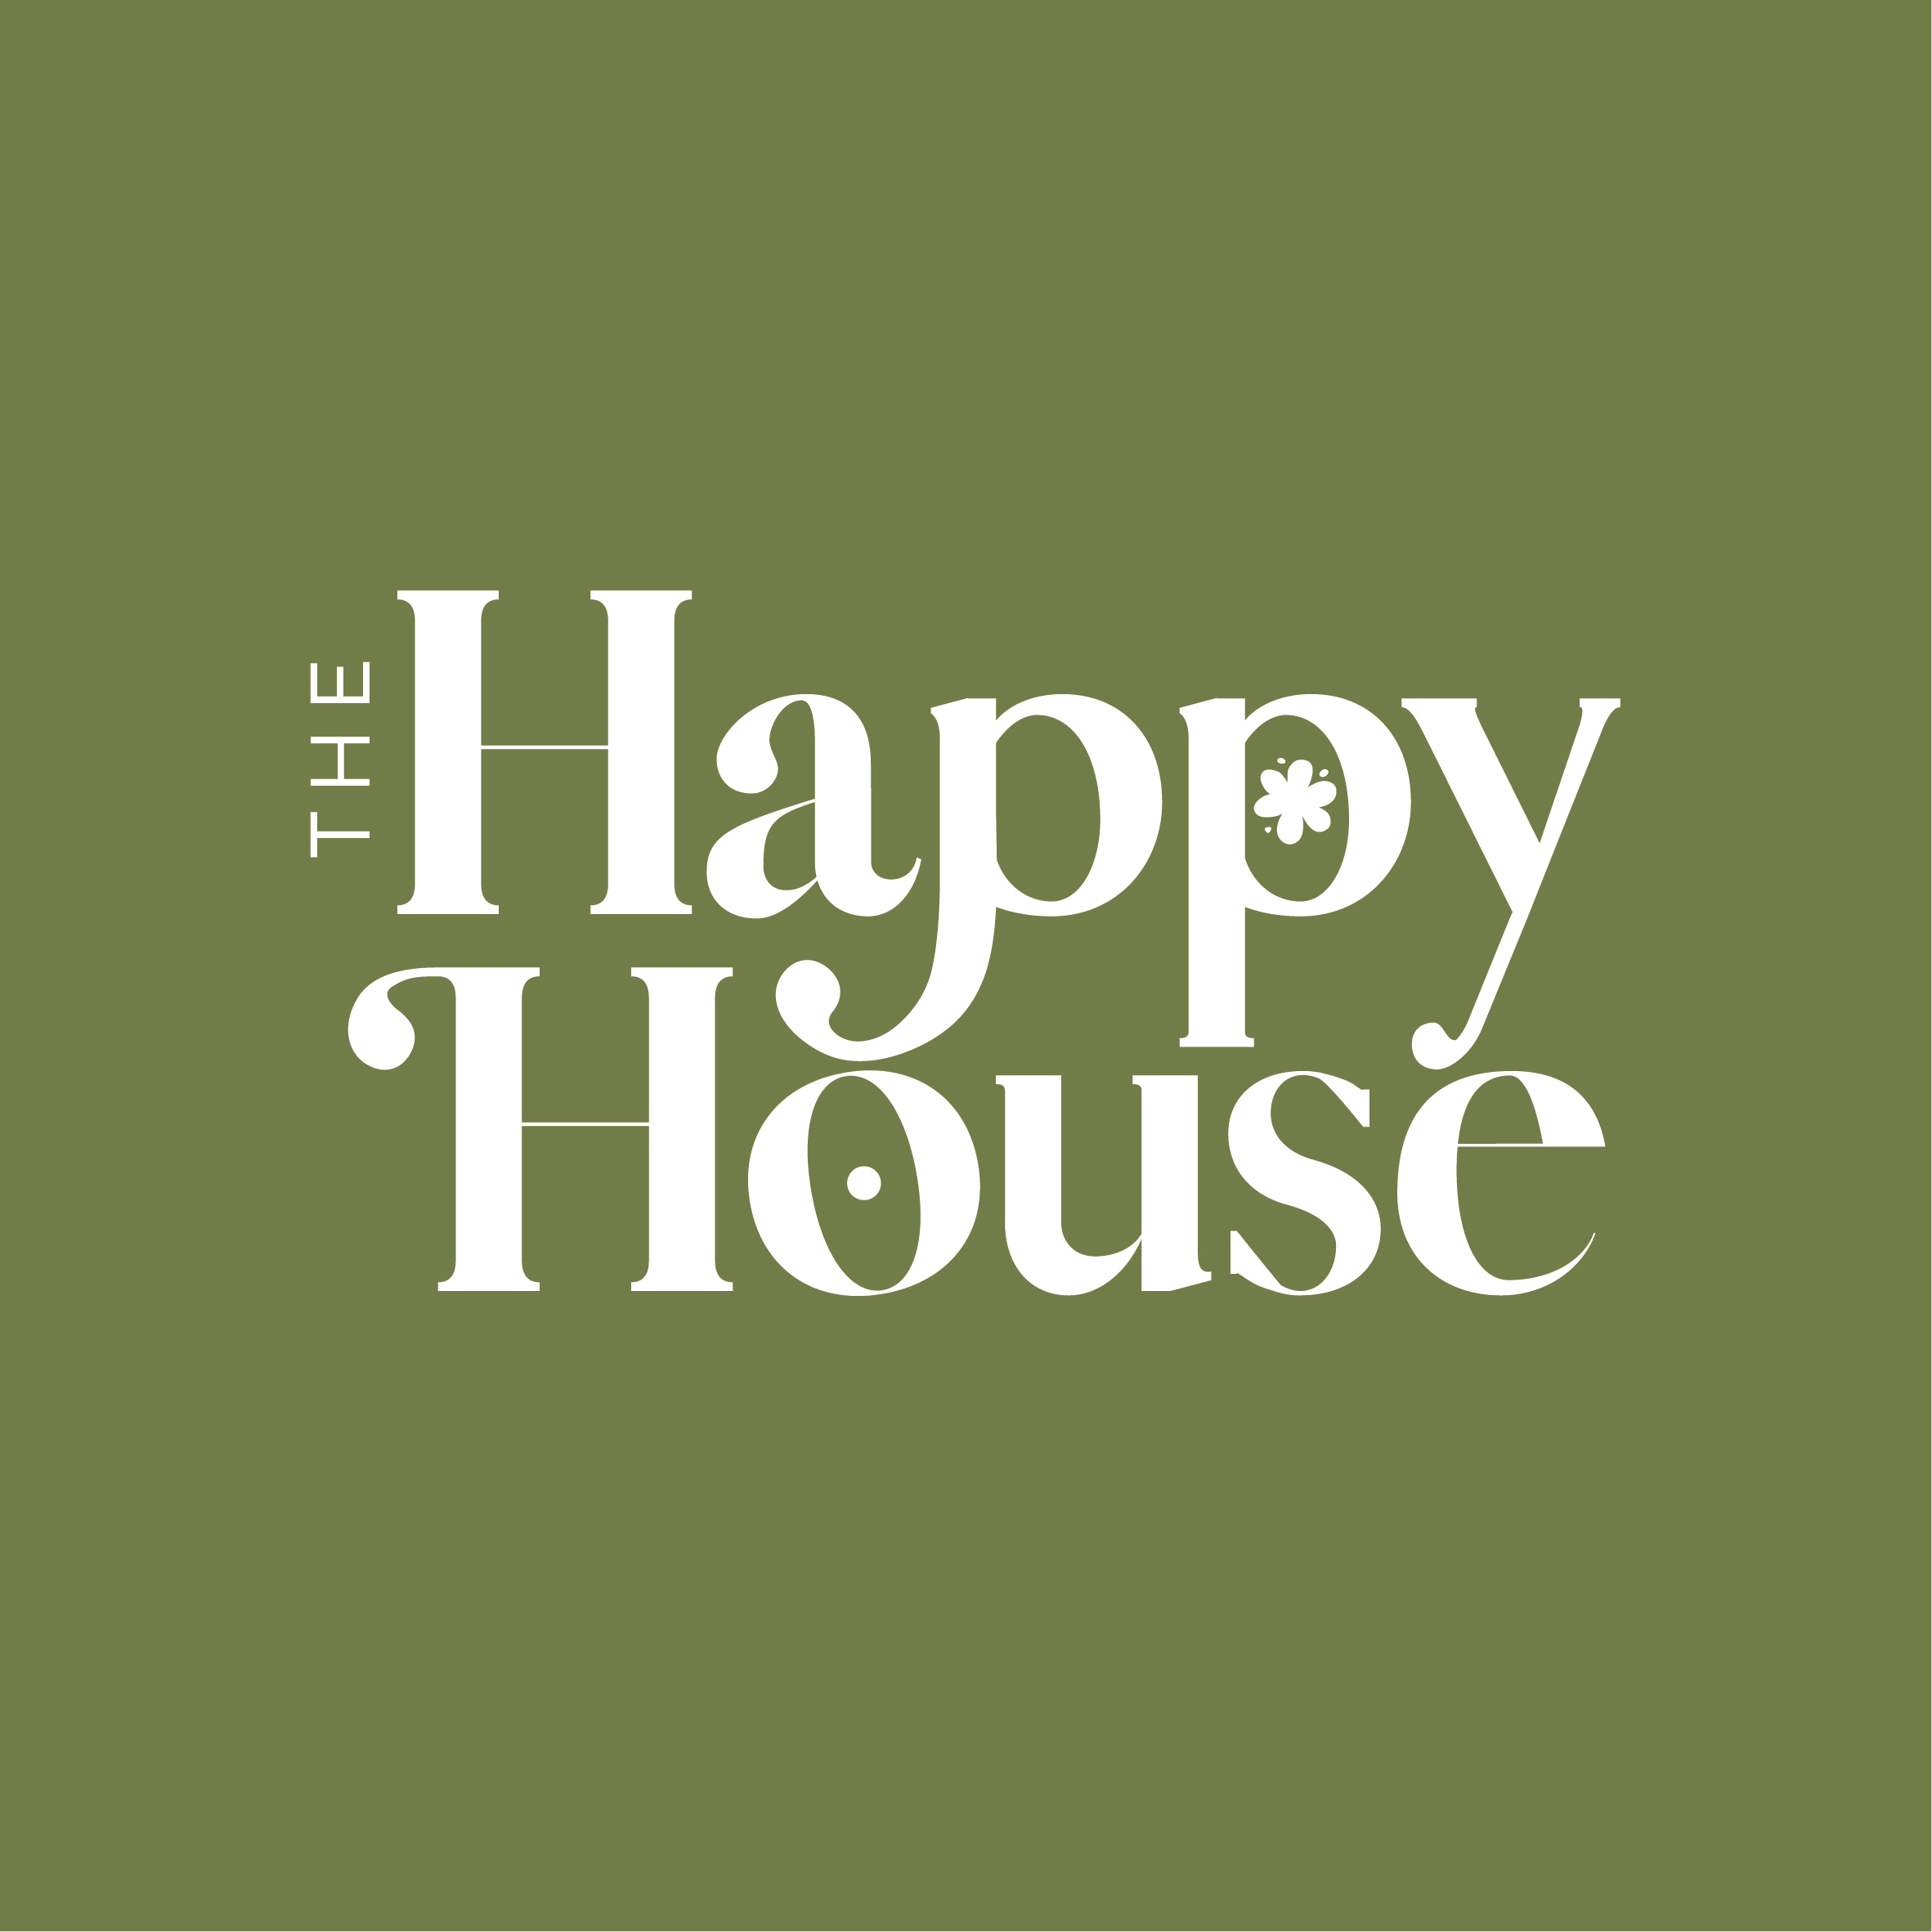 The Happy House Premade Logo